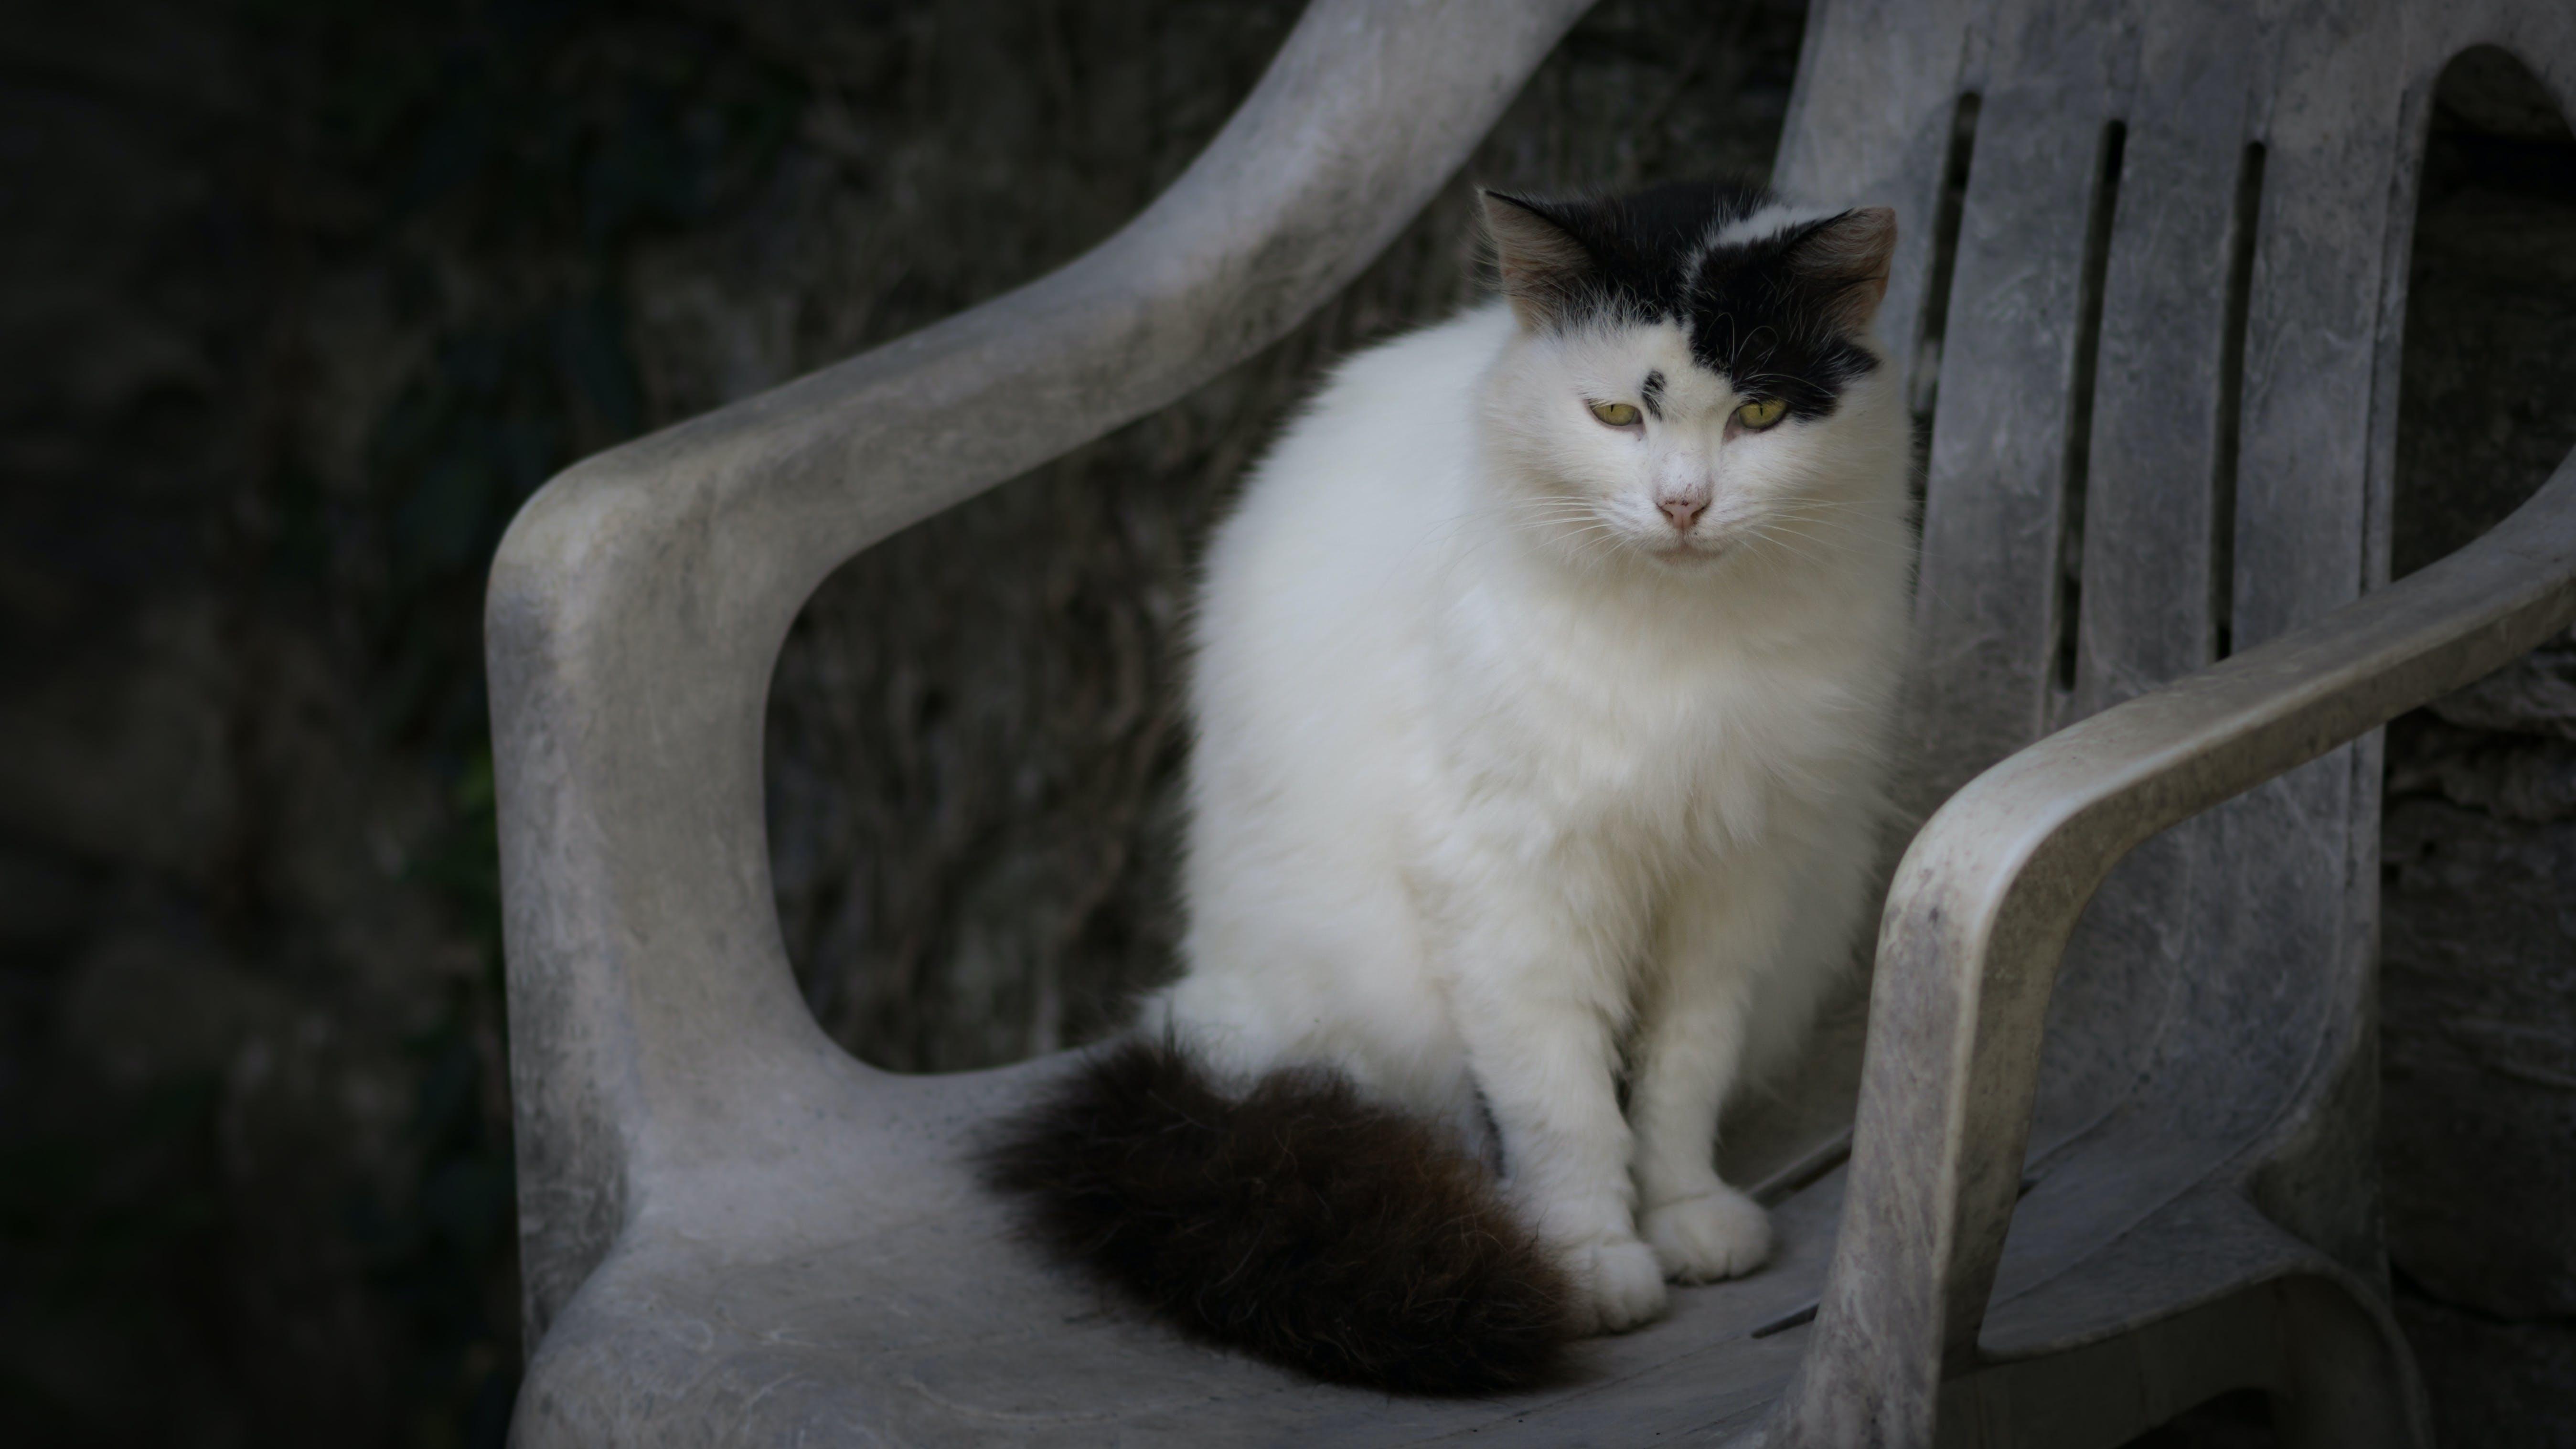 Free stock photo of animal, pet, chair, cat